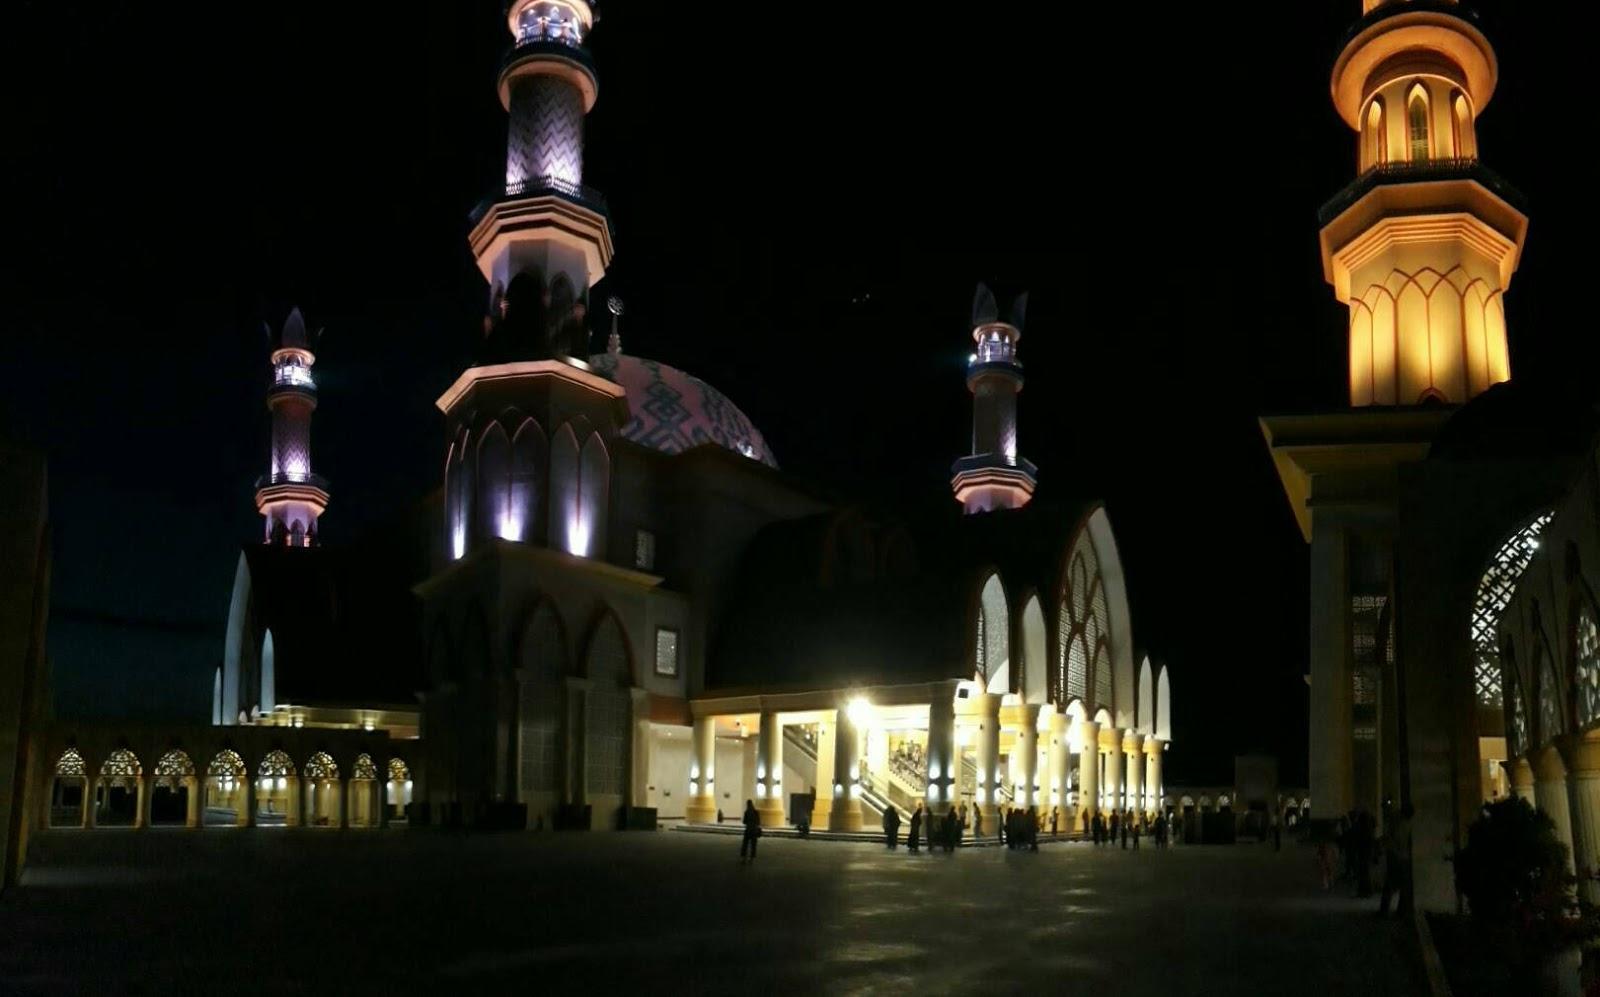 Shalat Idul Fitri Ntb Dipusatkan Islamic Center Adicamala Tenggara Barat